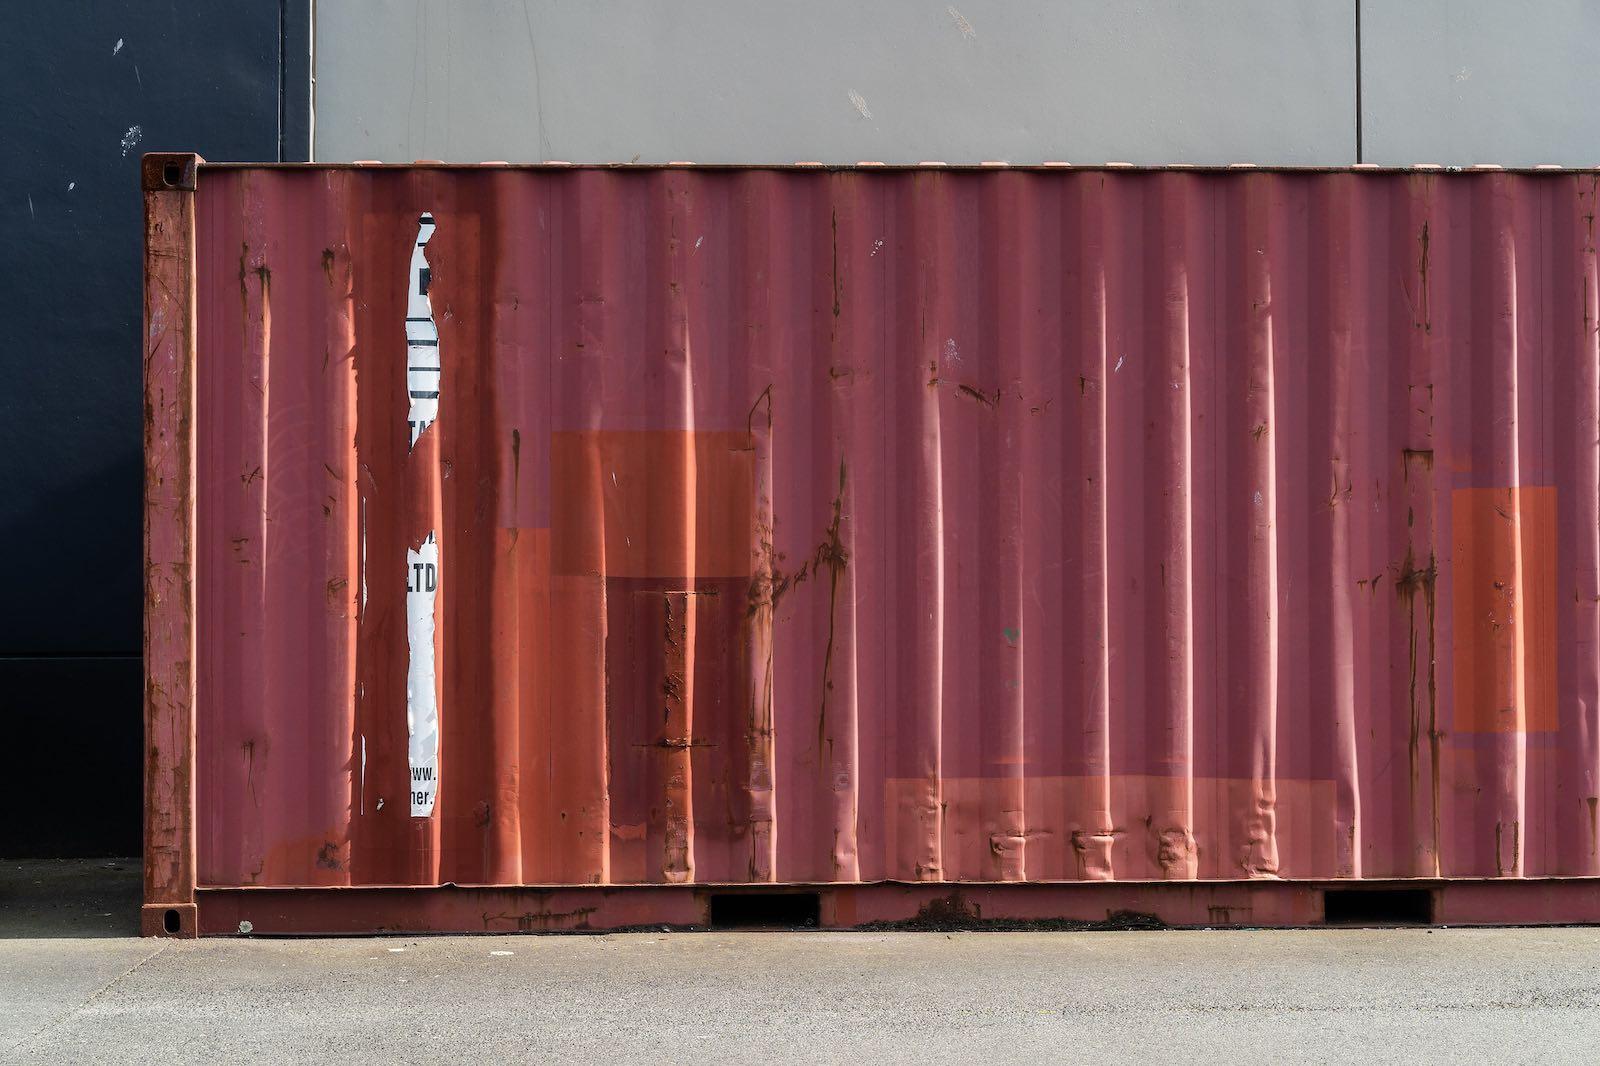 Safe? (Photo: Mark McGuire/Flickr)